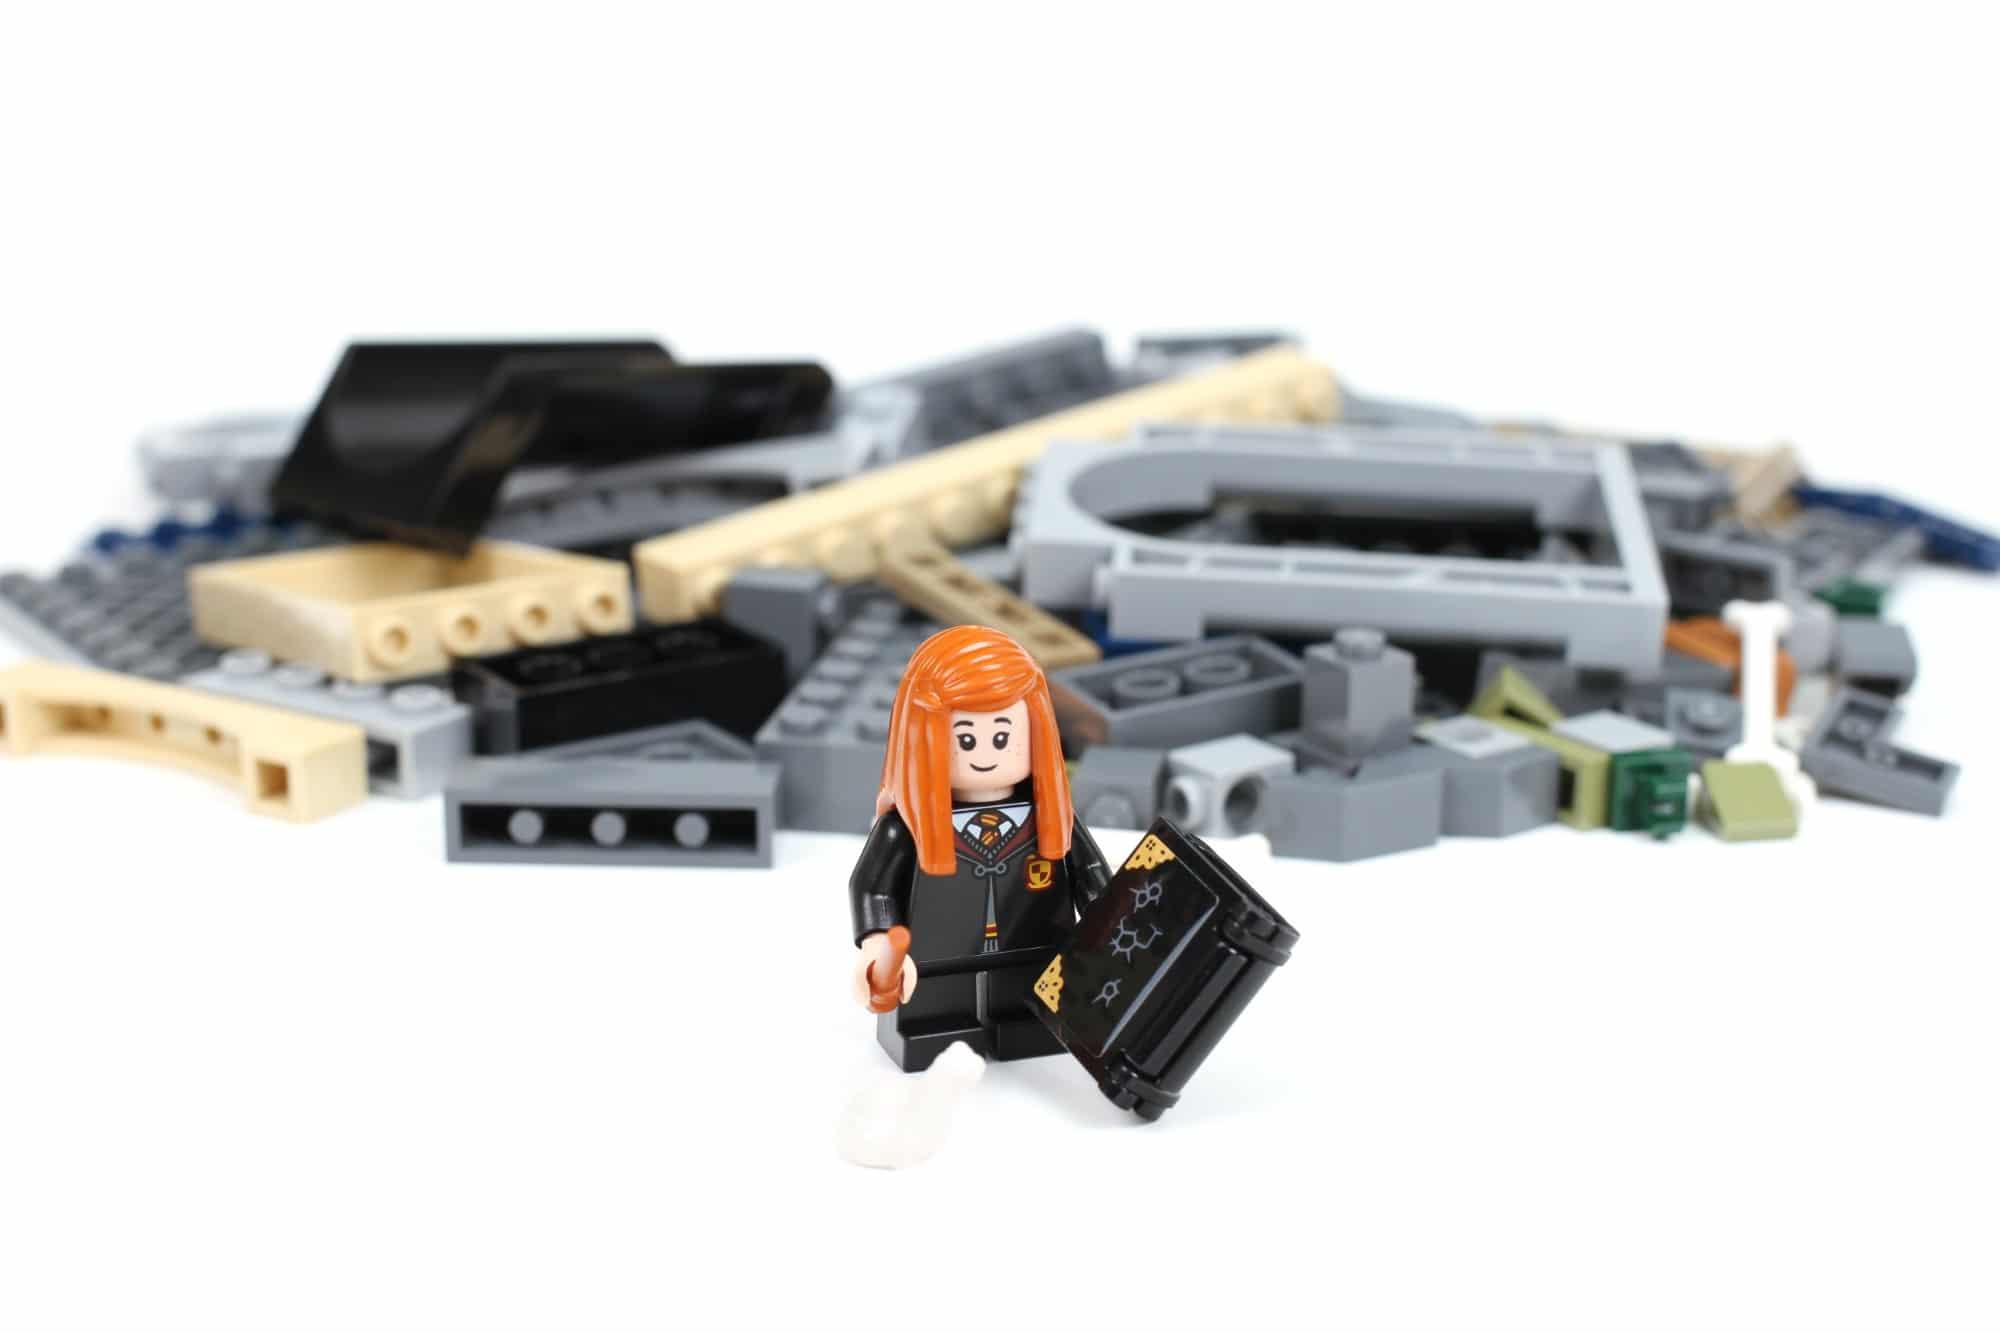 LEGO Harry Potter 76389 Hogwarts Kammer Des Schreckens Schritt 6 1